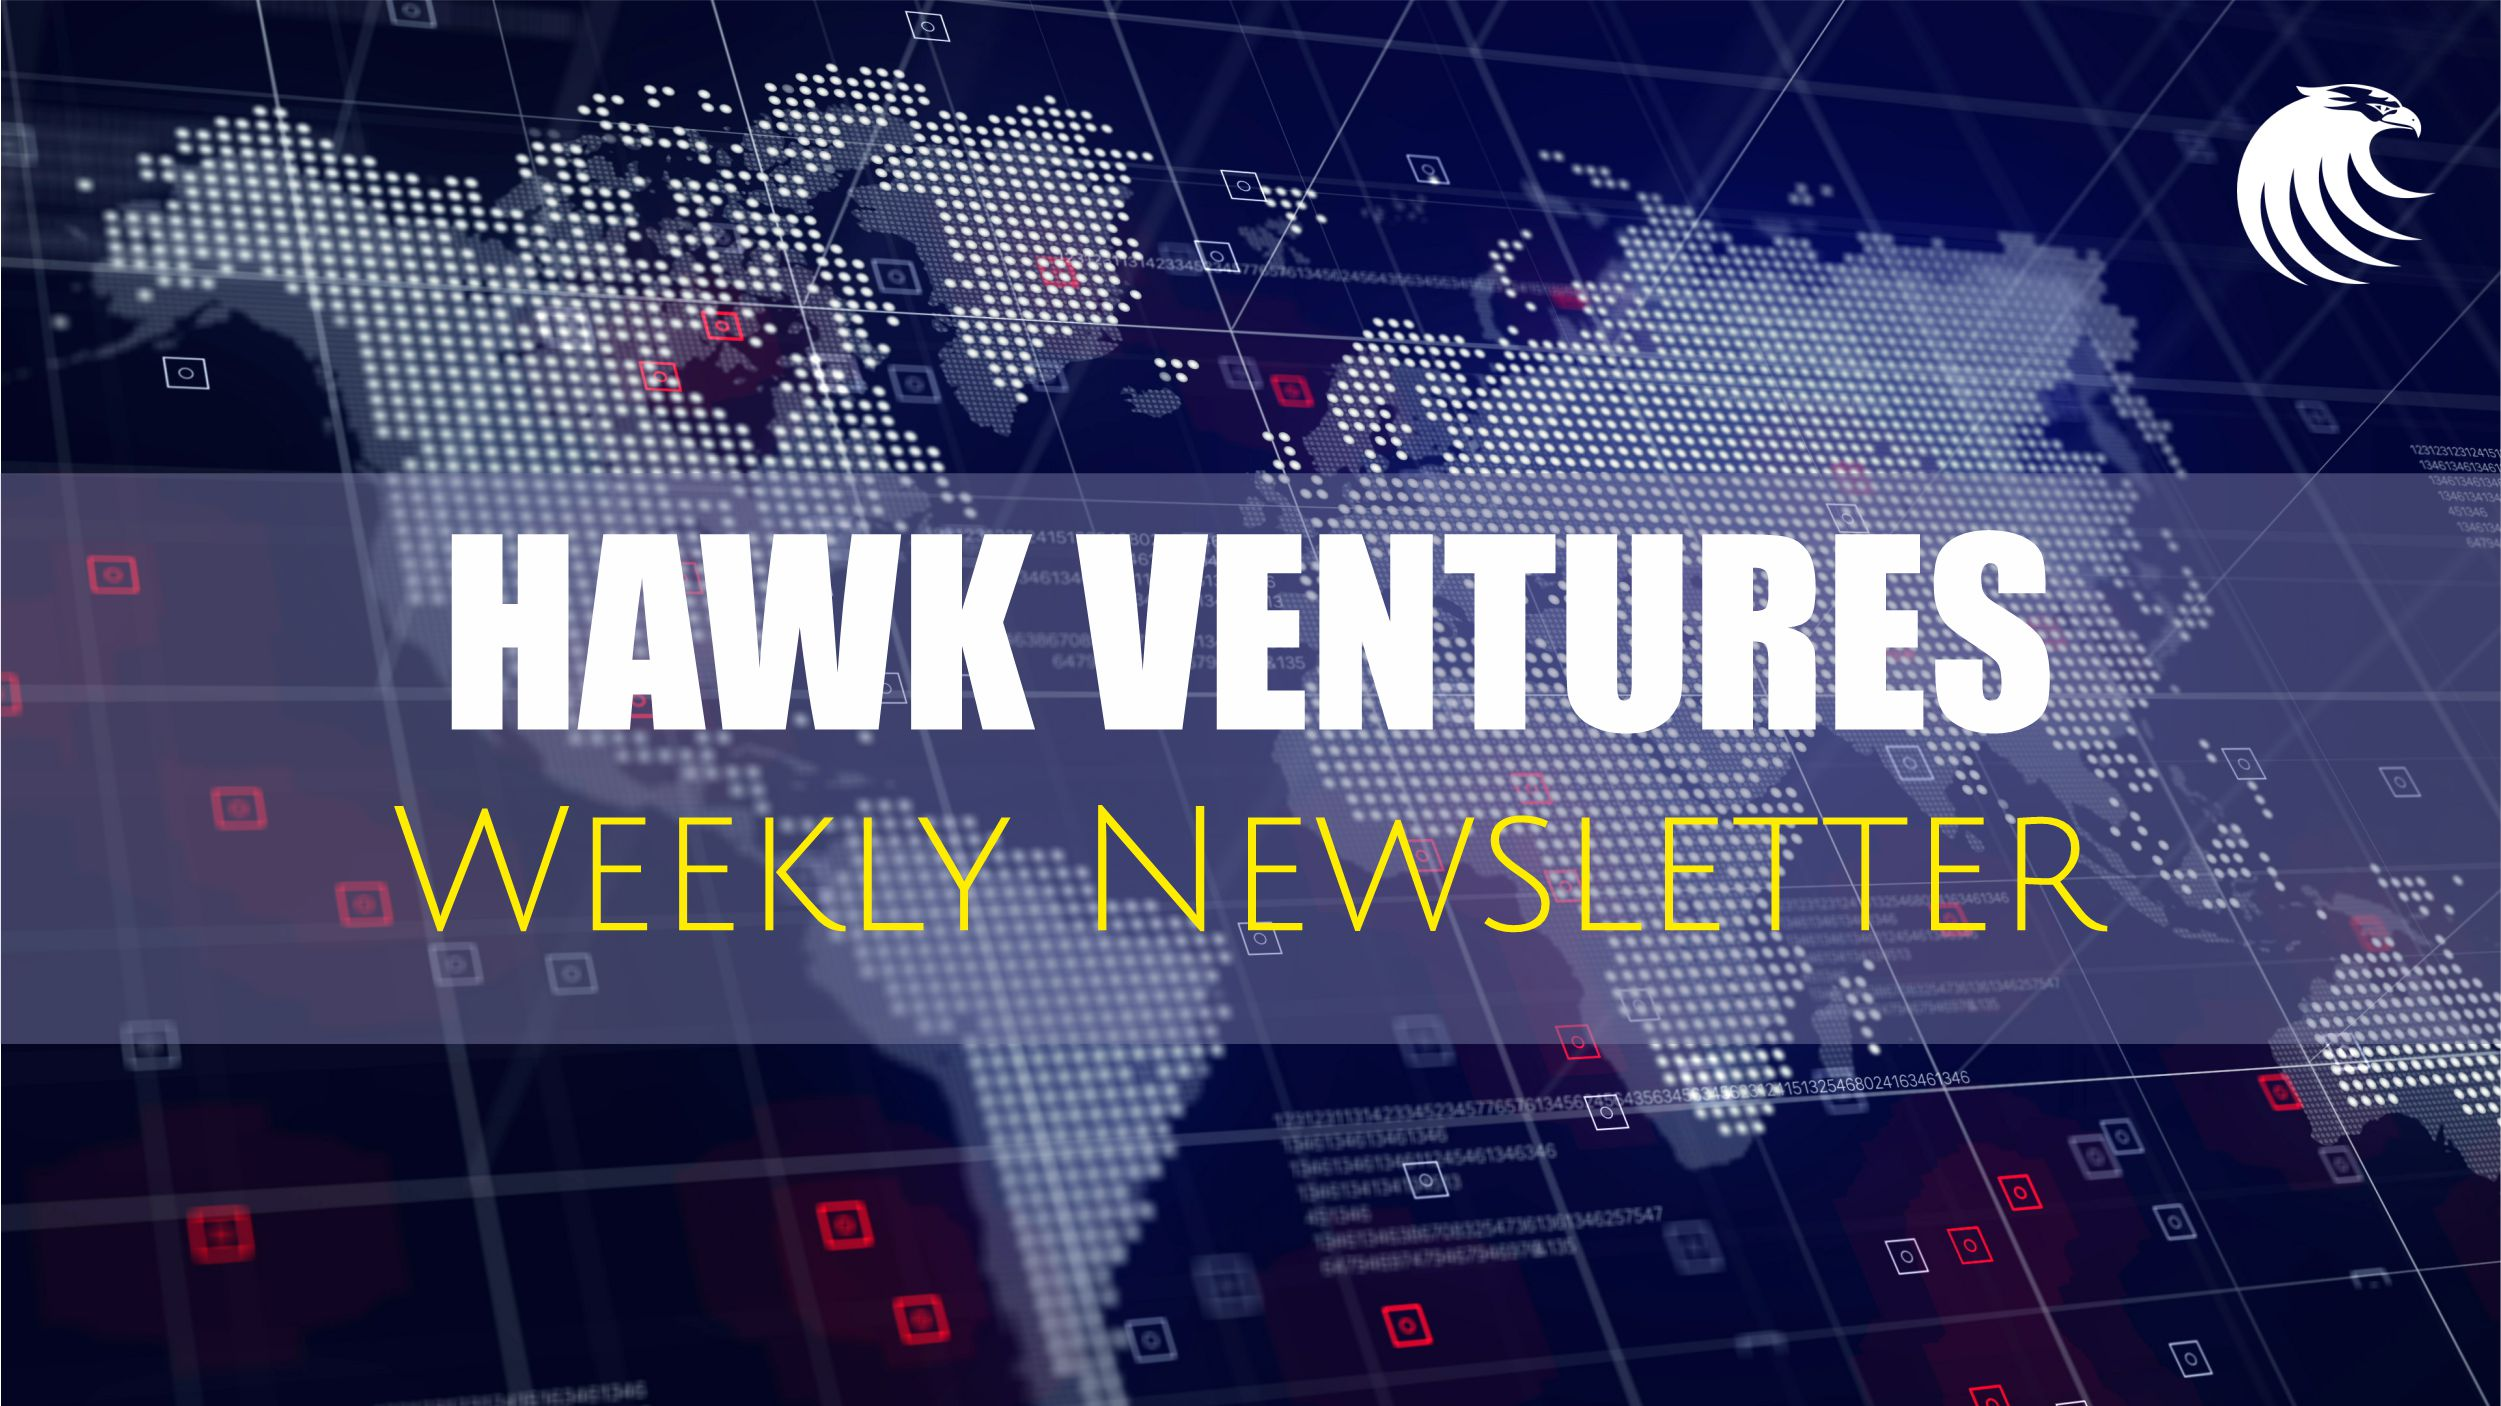 Hawkeye News Volume 1 Issue 2